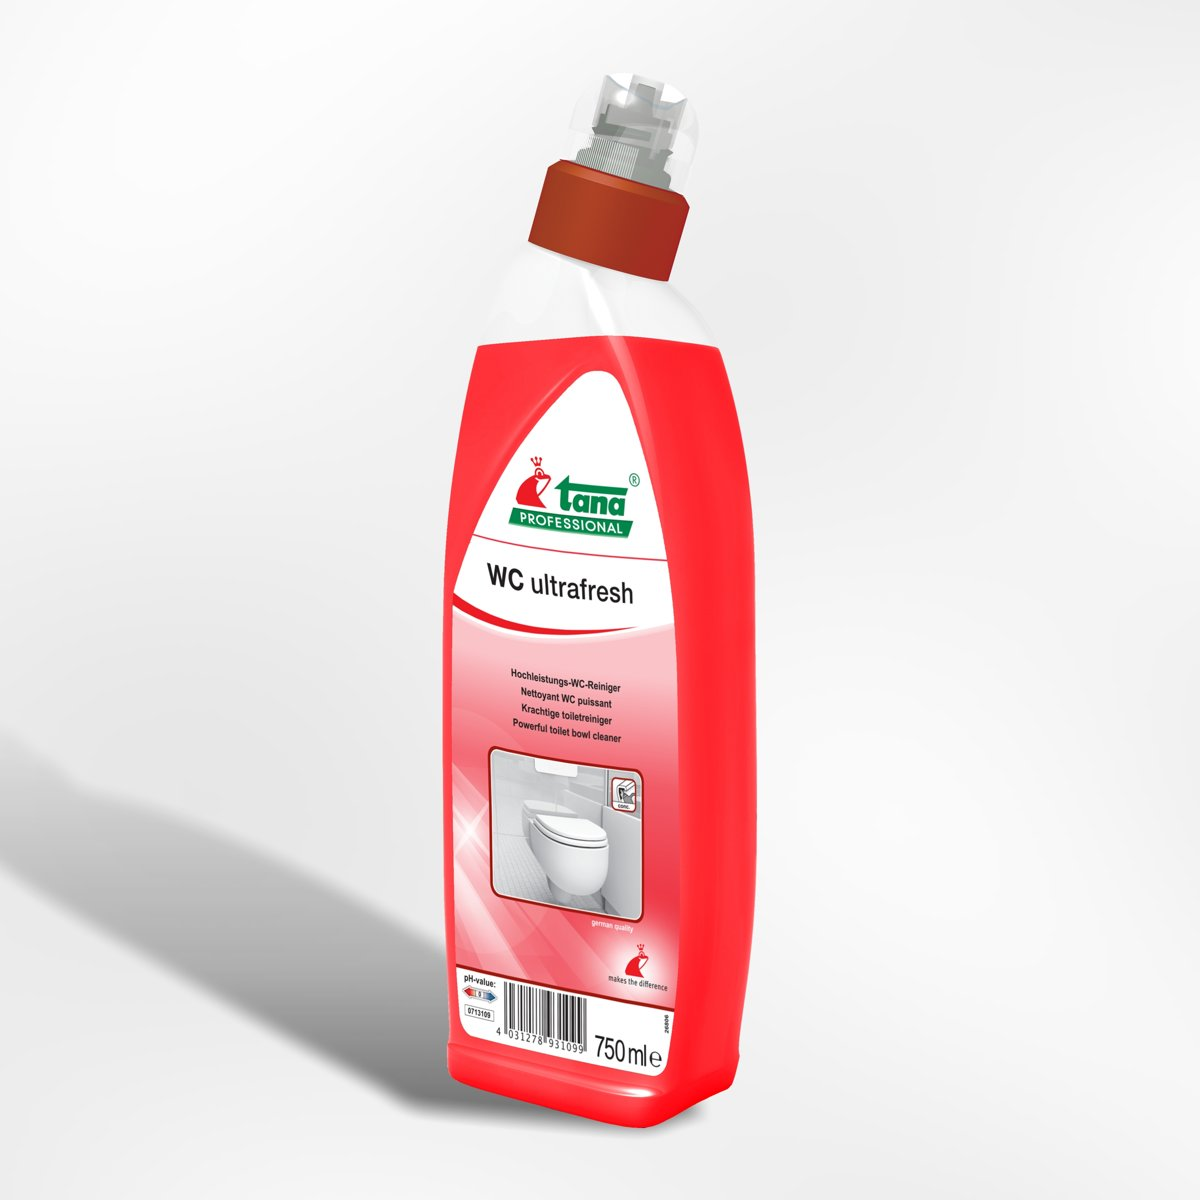 Tana WC ultrafresh - Toiletreiniger - 750 ml kopen